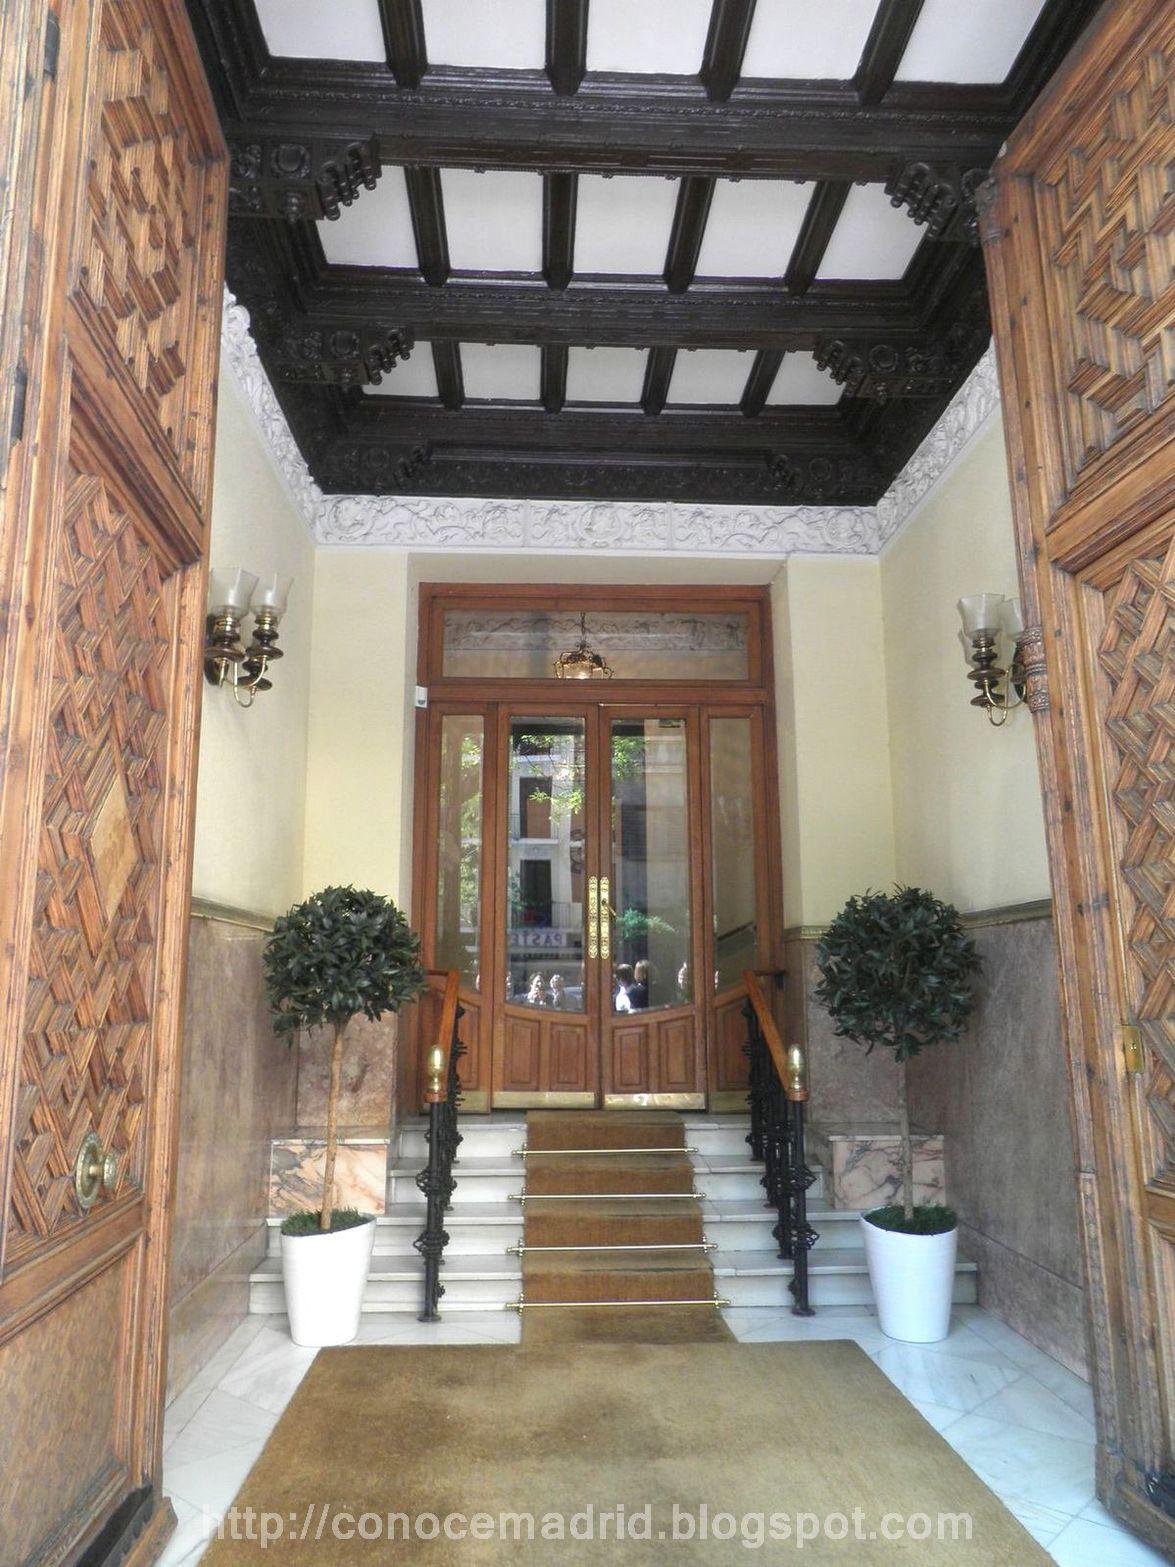 Conocer madrid mayo 2012 for Oficinas ono madrid